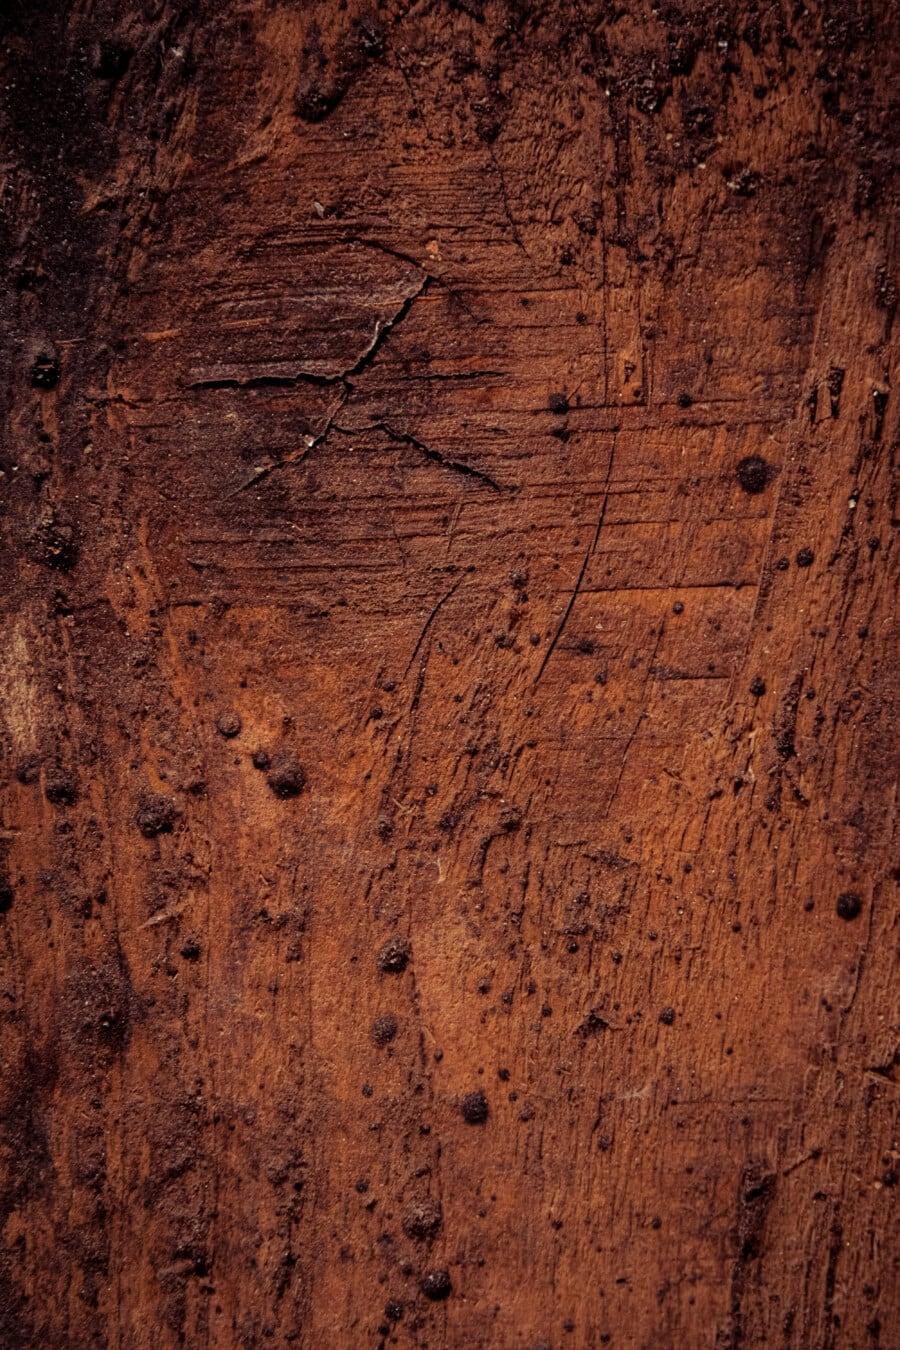 plank, vertical, wooden, texture, hardwood, knot, dark, brown, carpentry, material